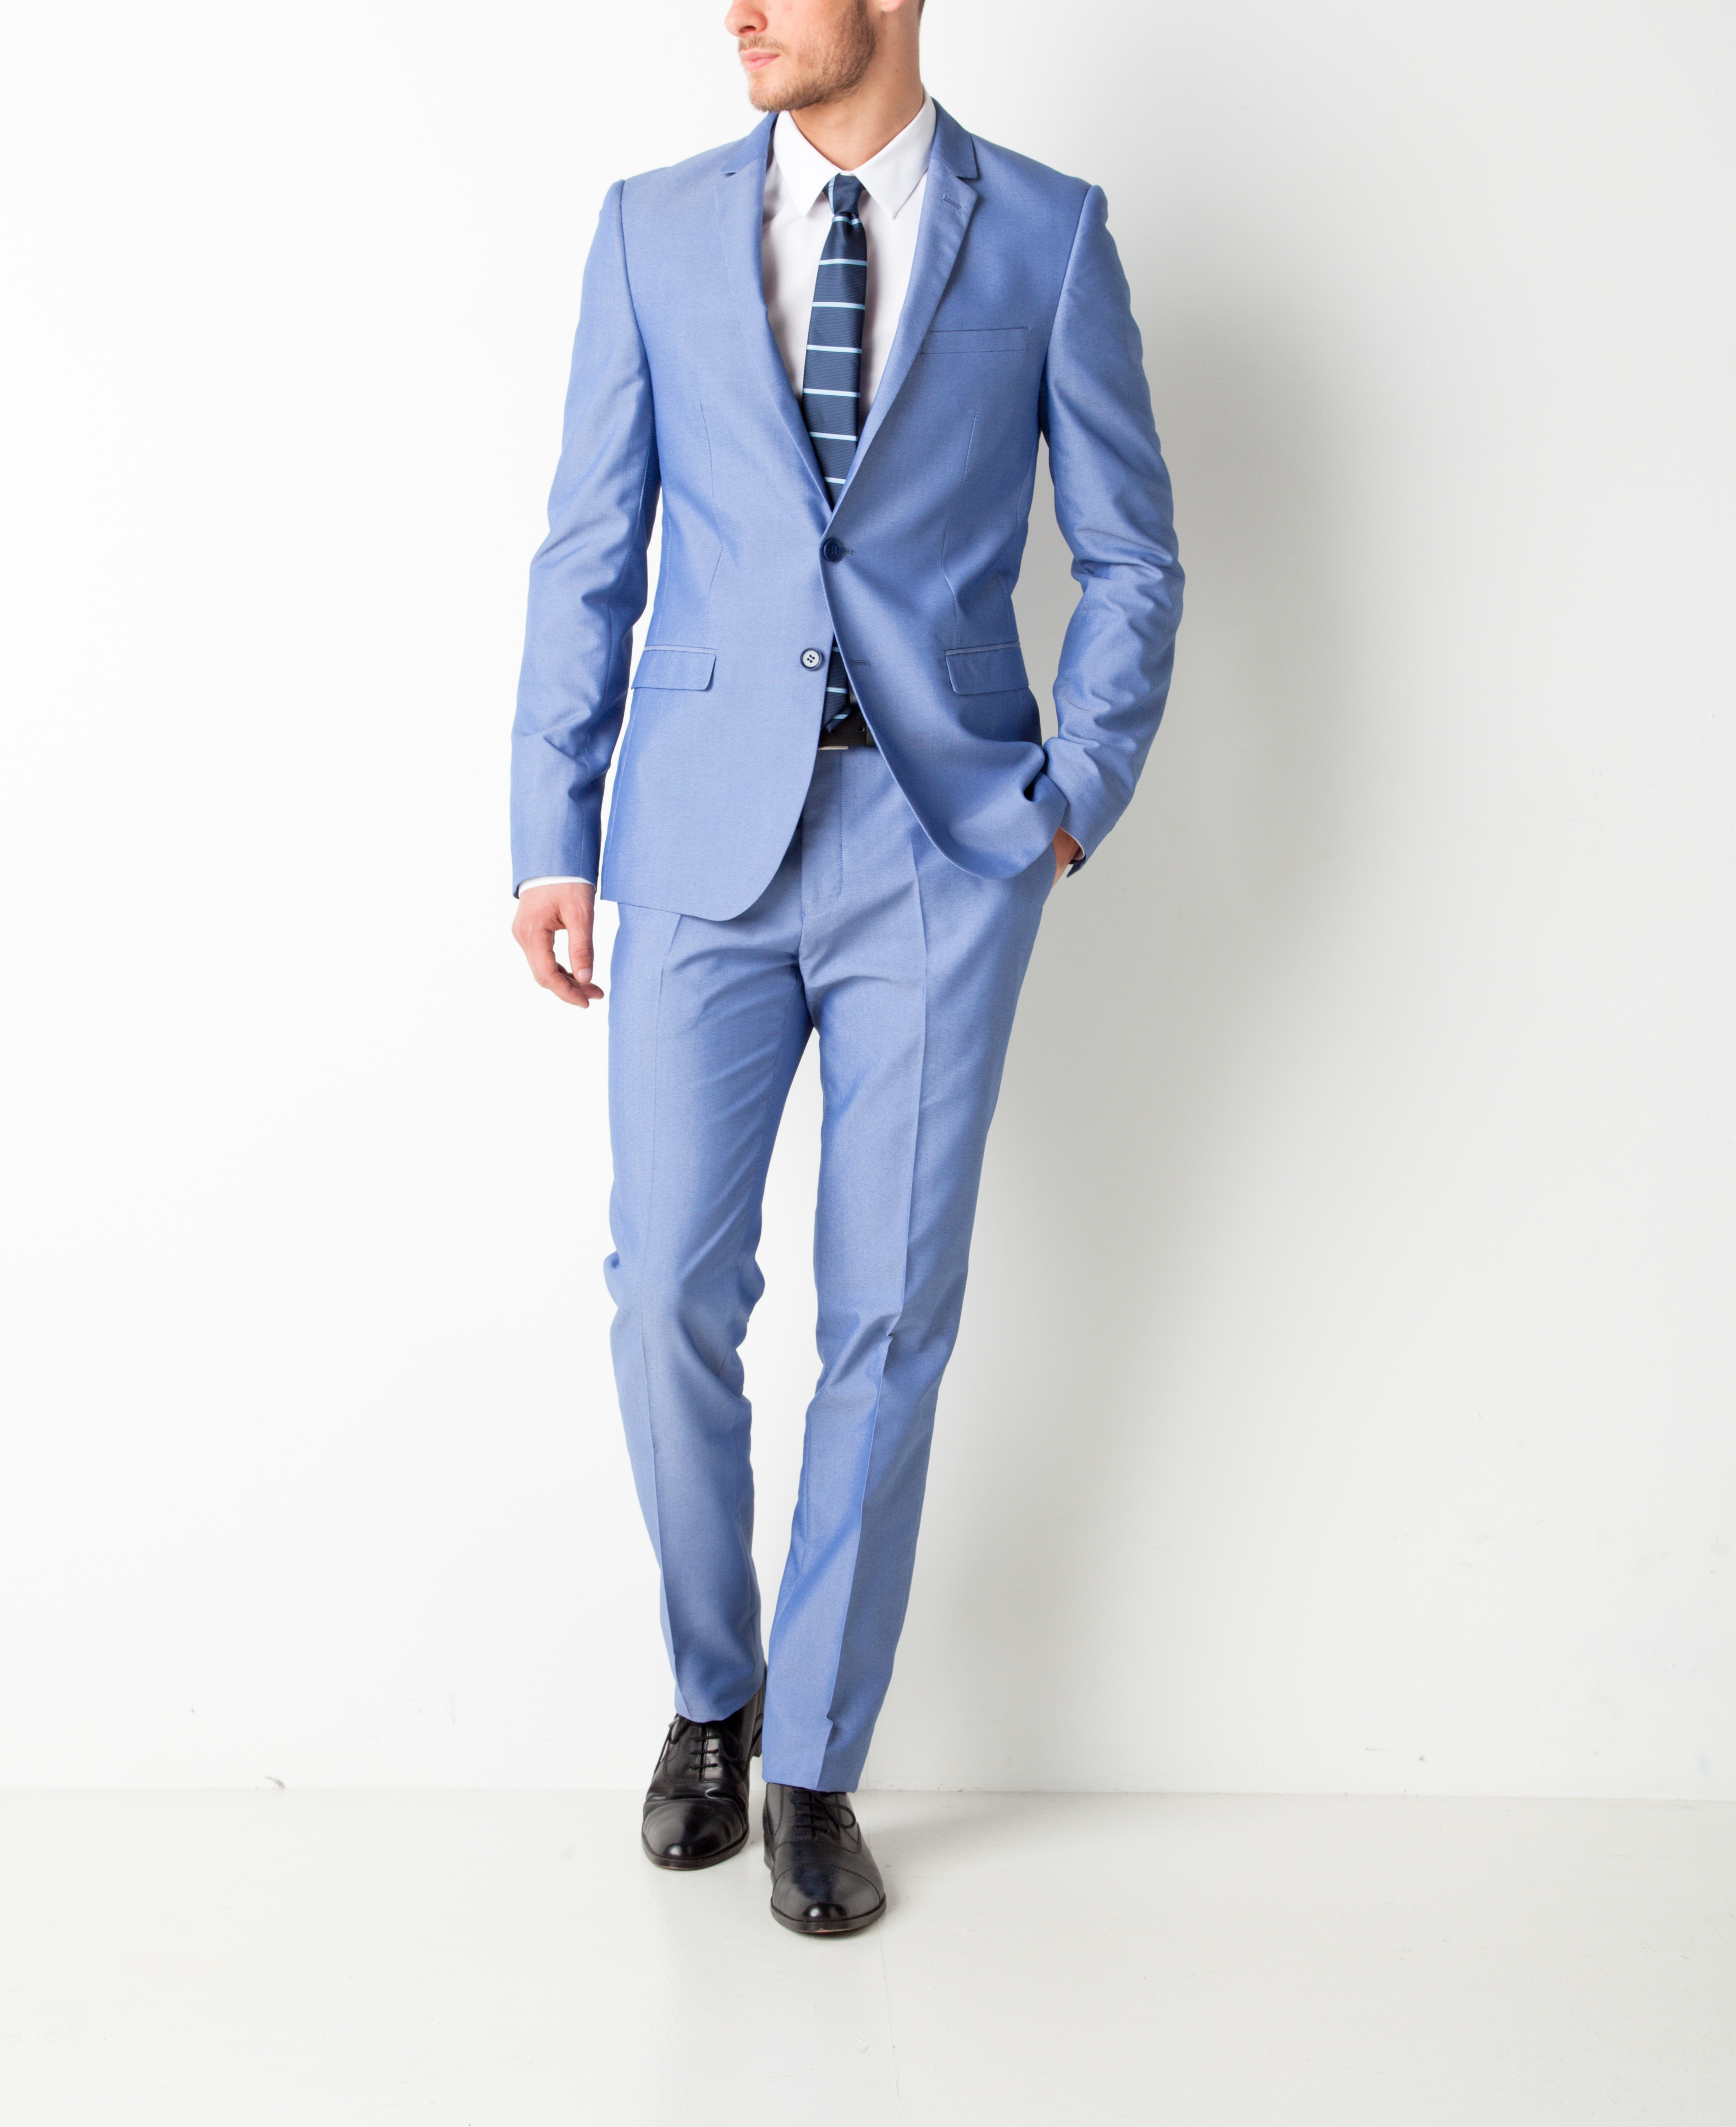 Costume homme bleu pr t porter f minin et masculin - Costume homme pret a porter ...